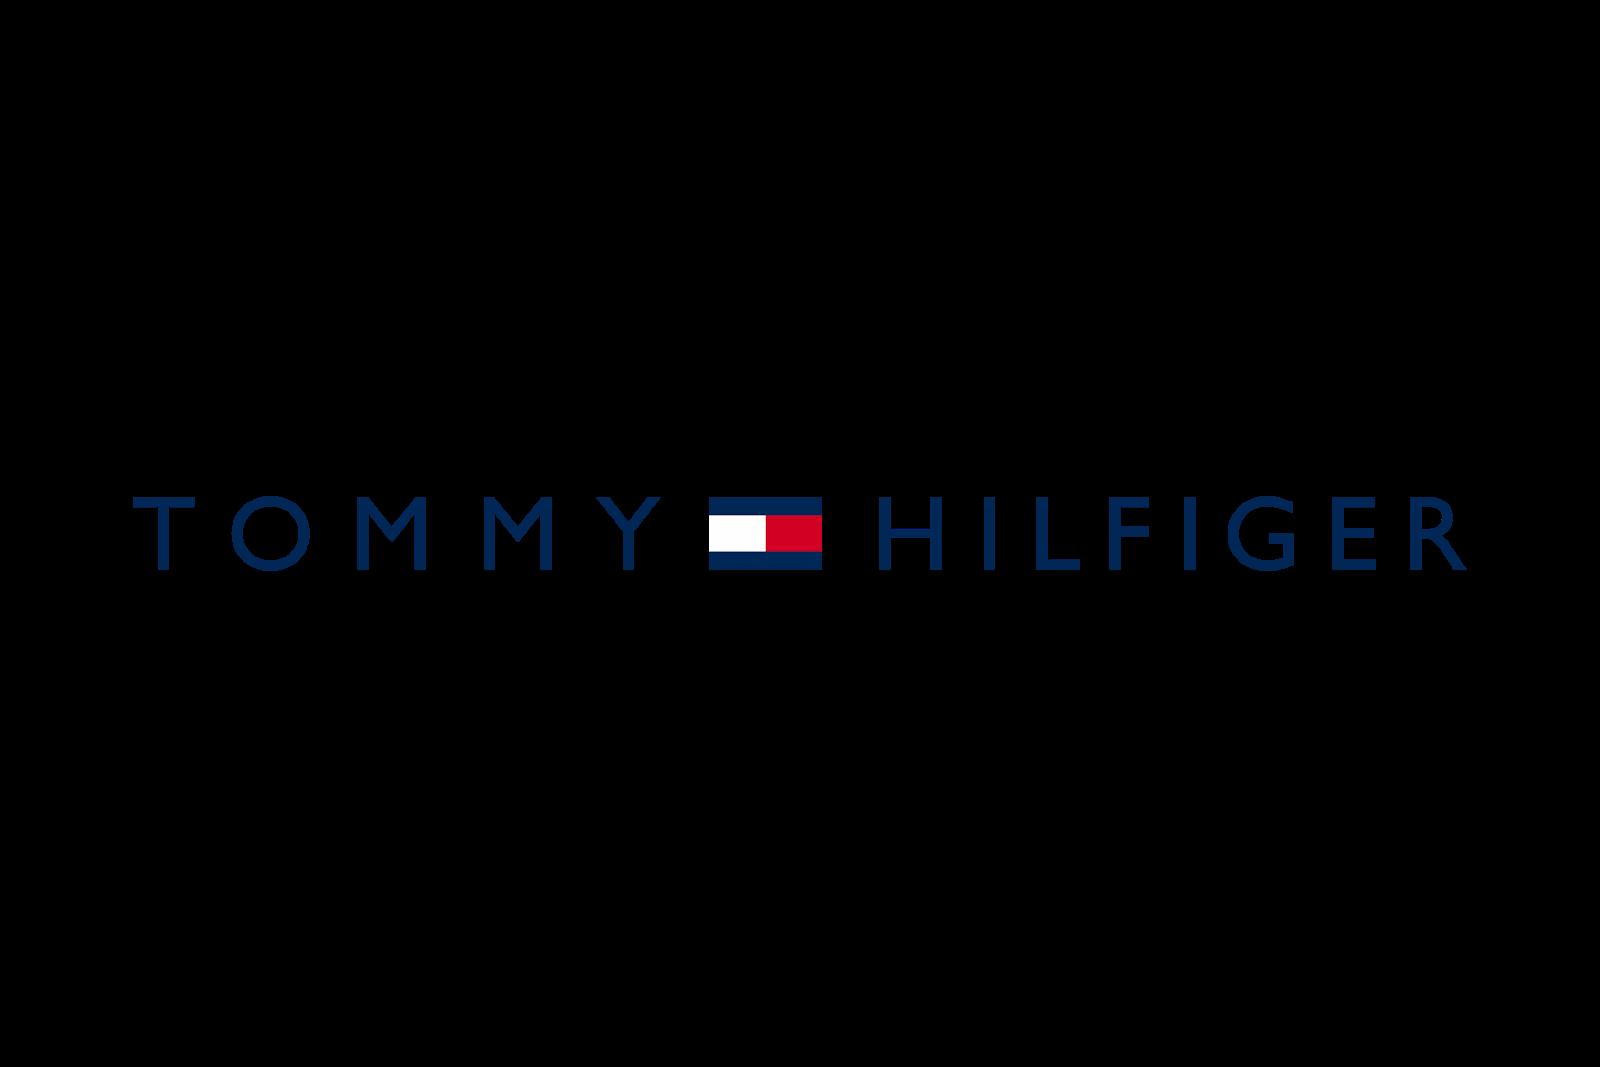 Logo Tommy_Hilfiger